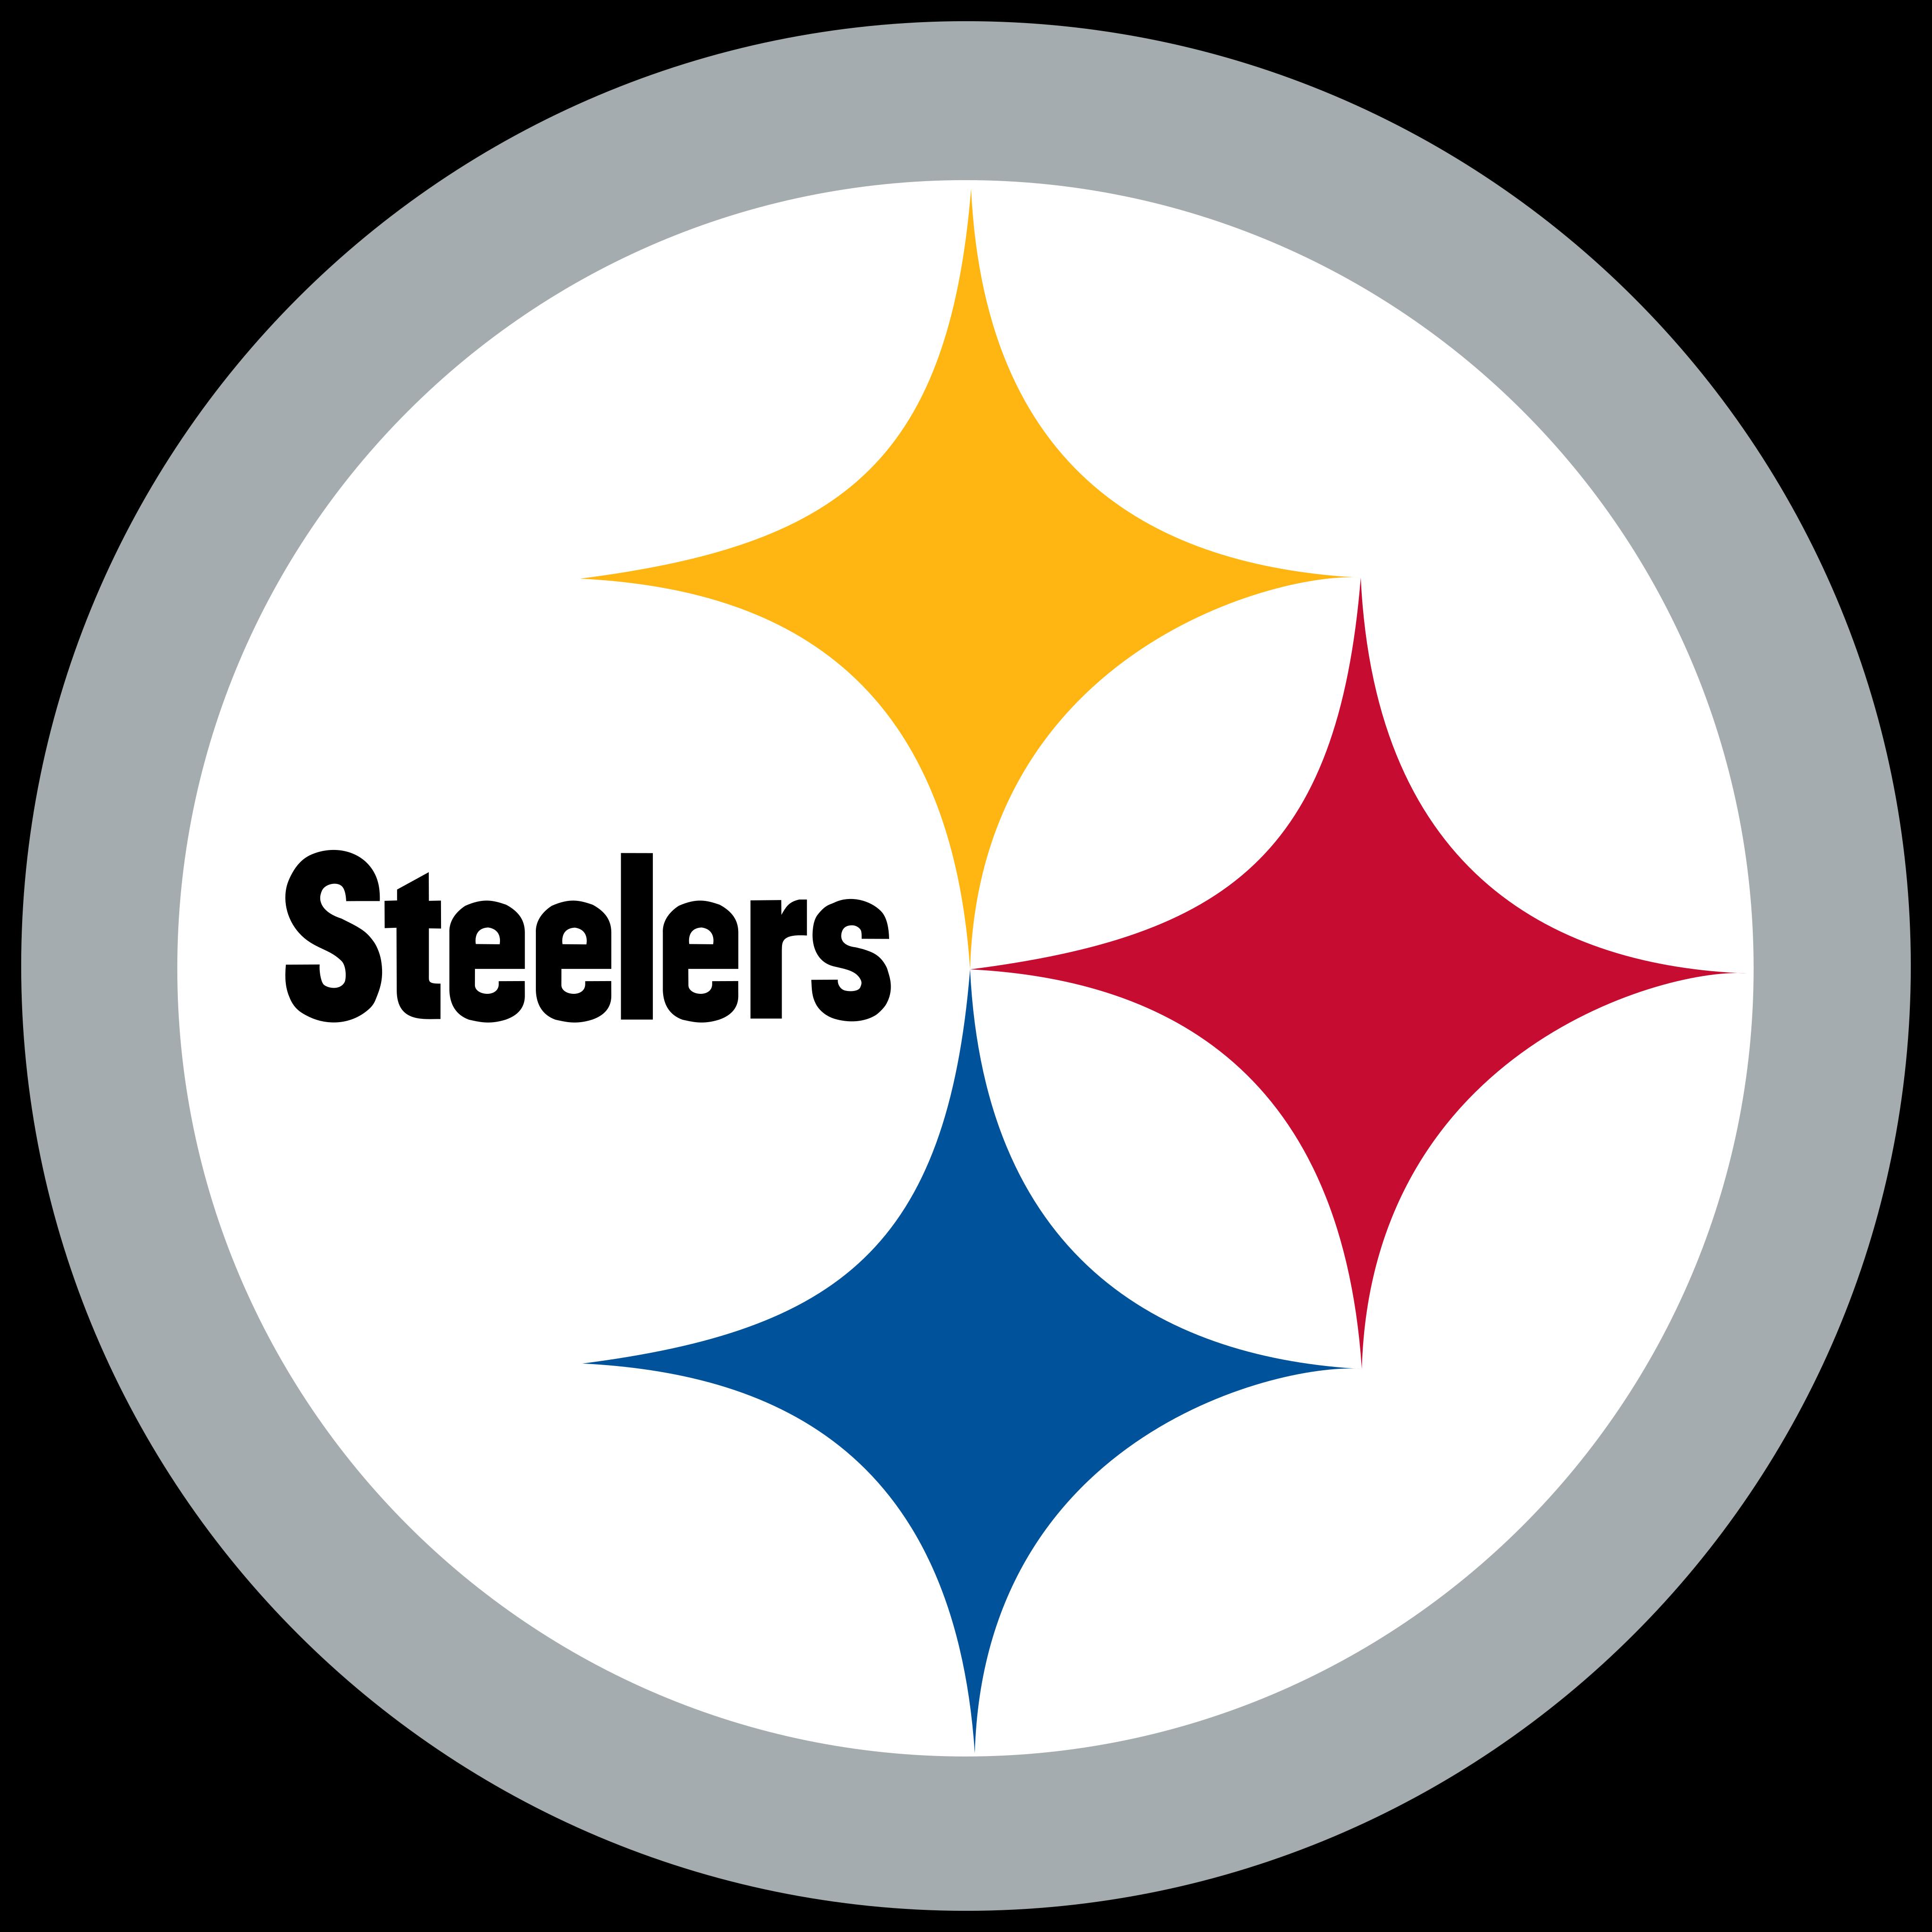 pittsburgh steelers logo - Pittsburgh Steelers Logo